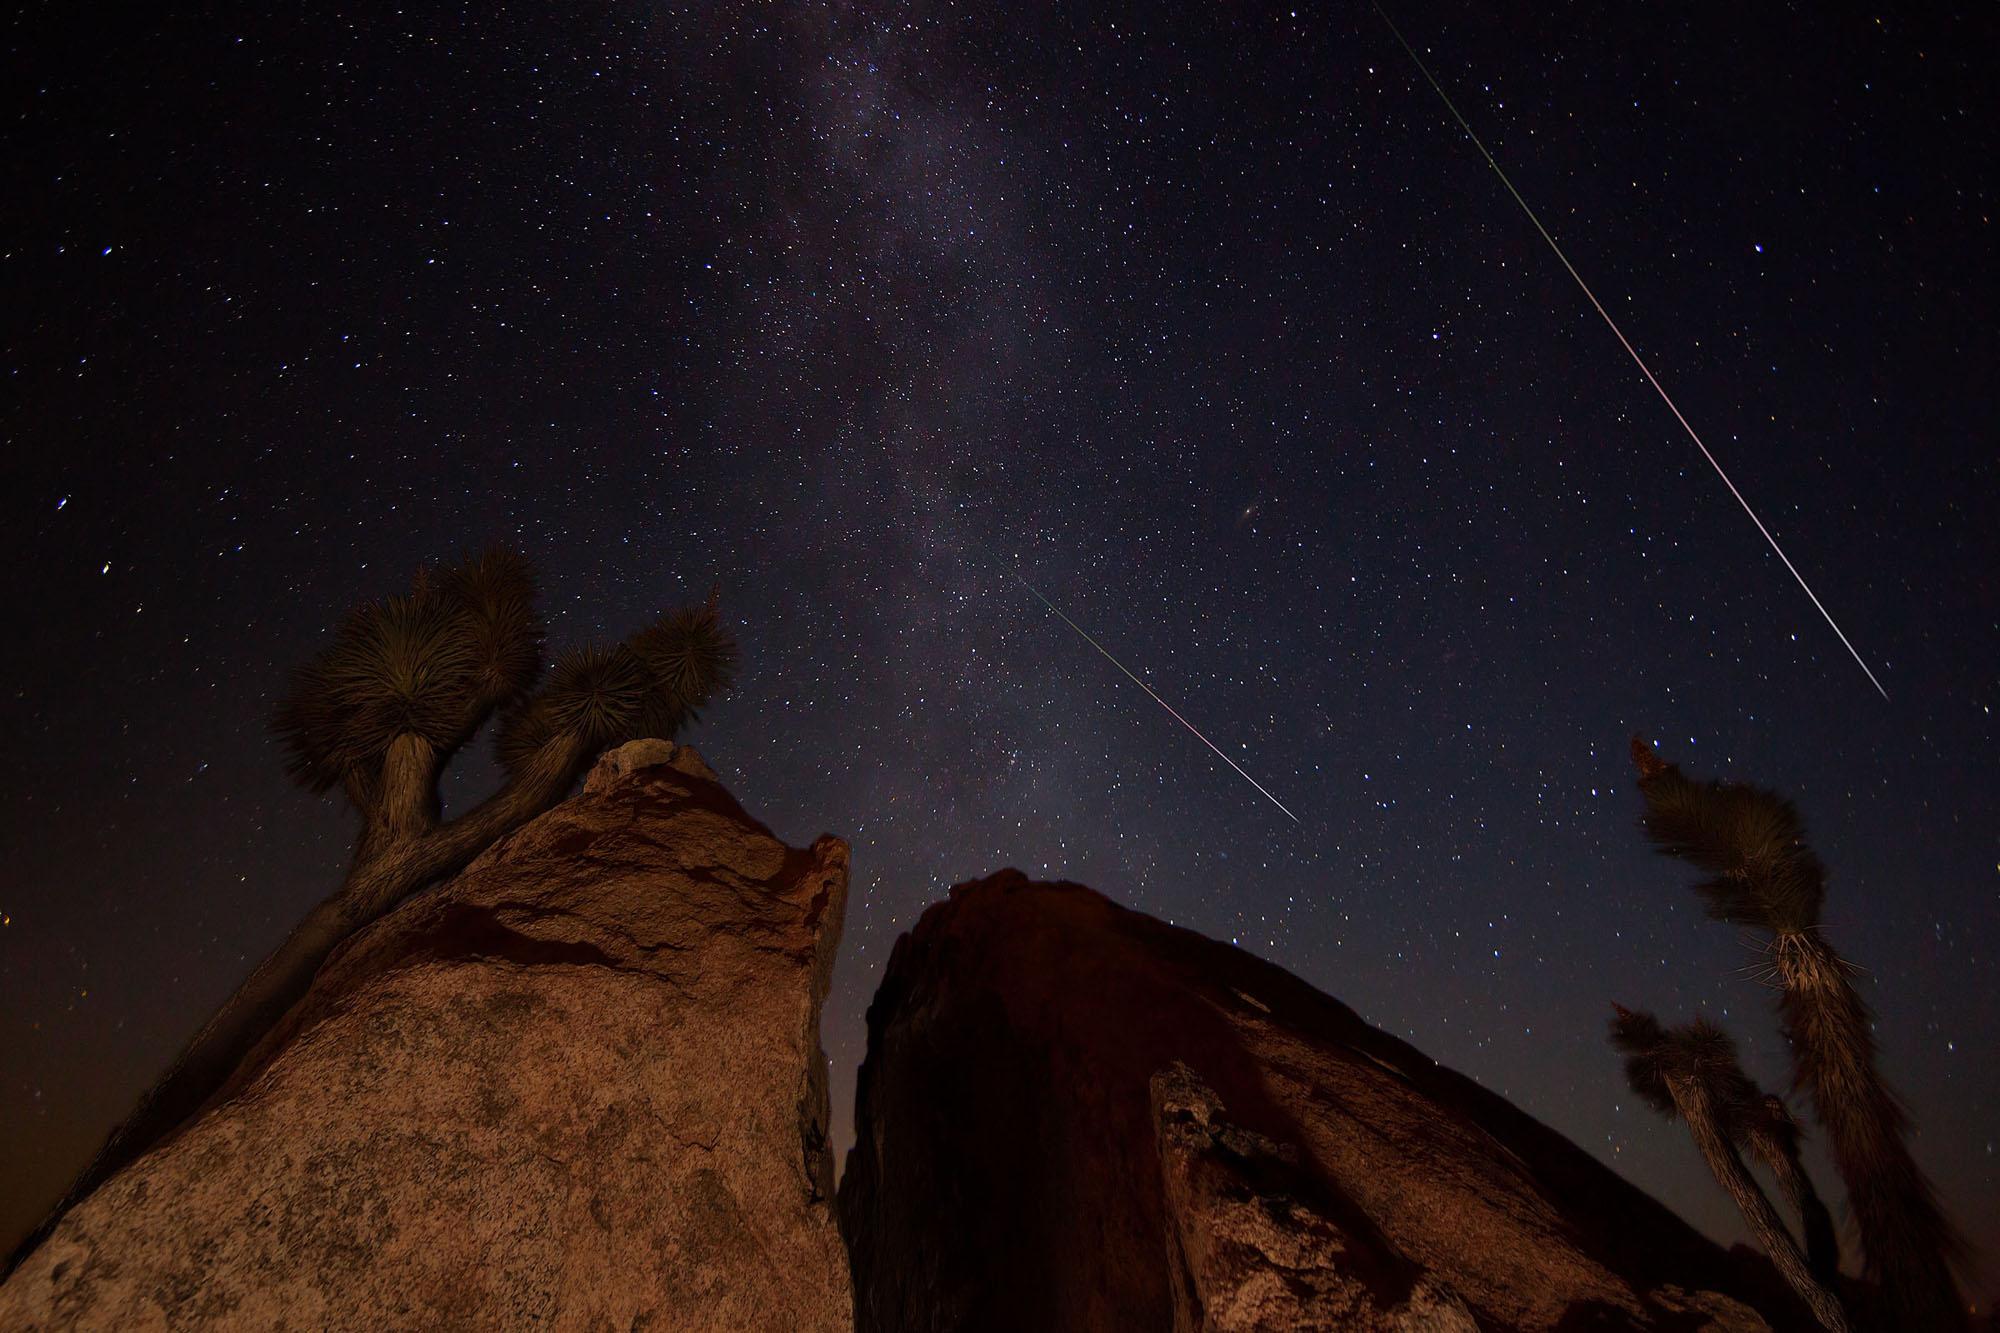 Joshua Tree National Park: Sunset and Star Shots